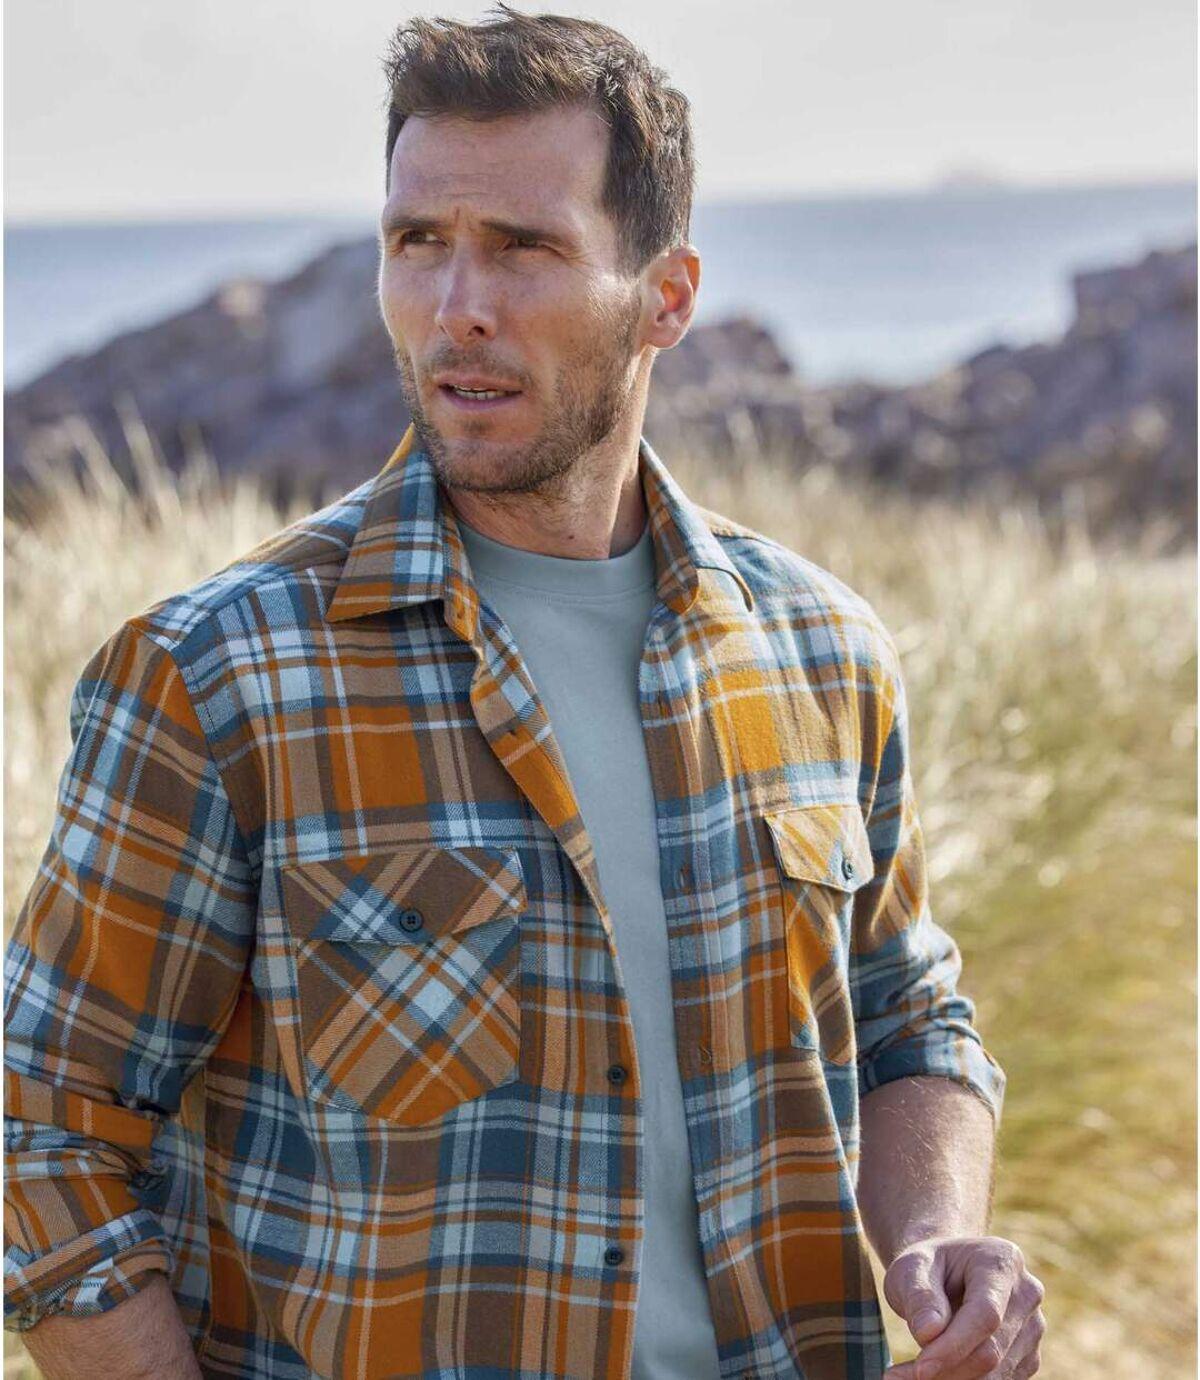 Flanellhemd Schottland Atlas For Men